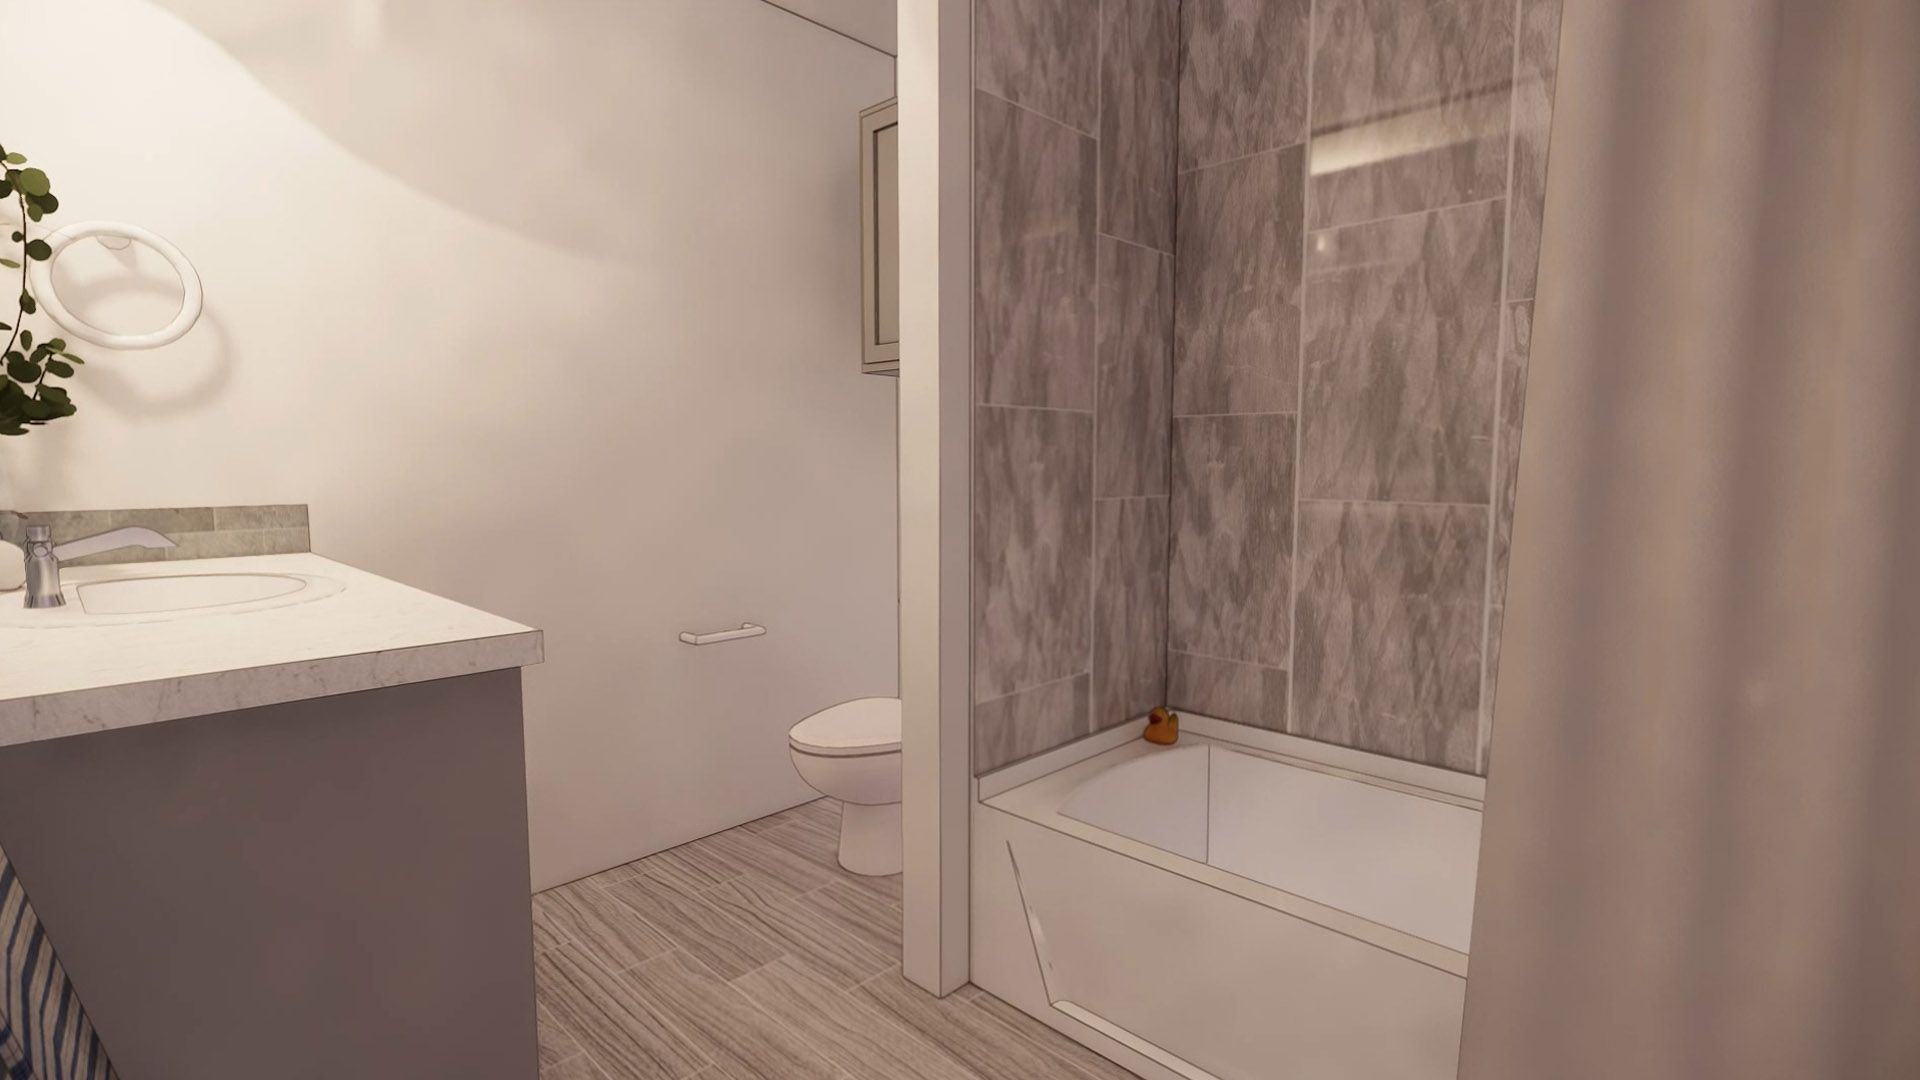 Bathroom featured in the Adalynn By Betenbough Homes in Midland-Odessa, TX